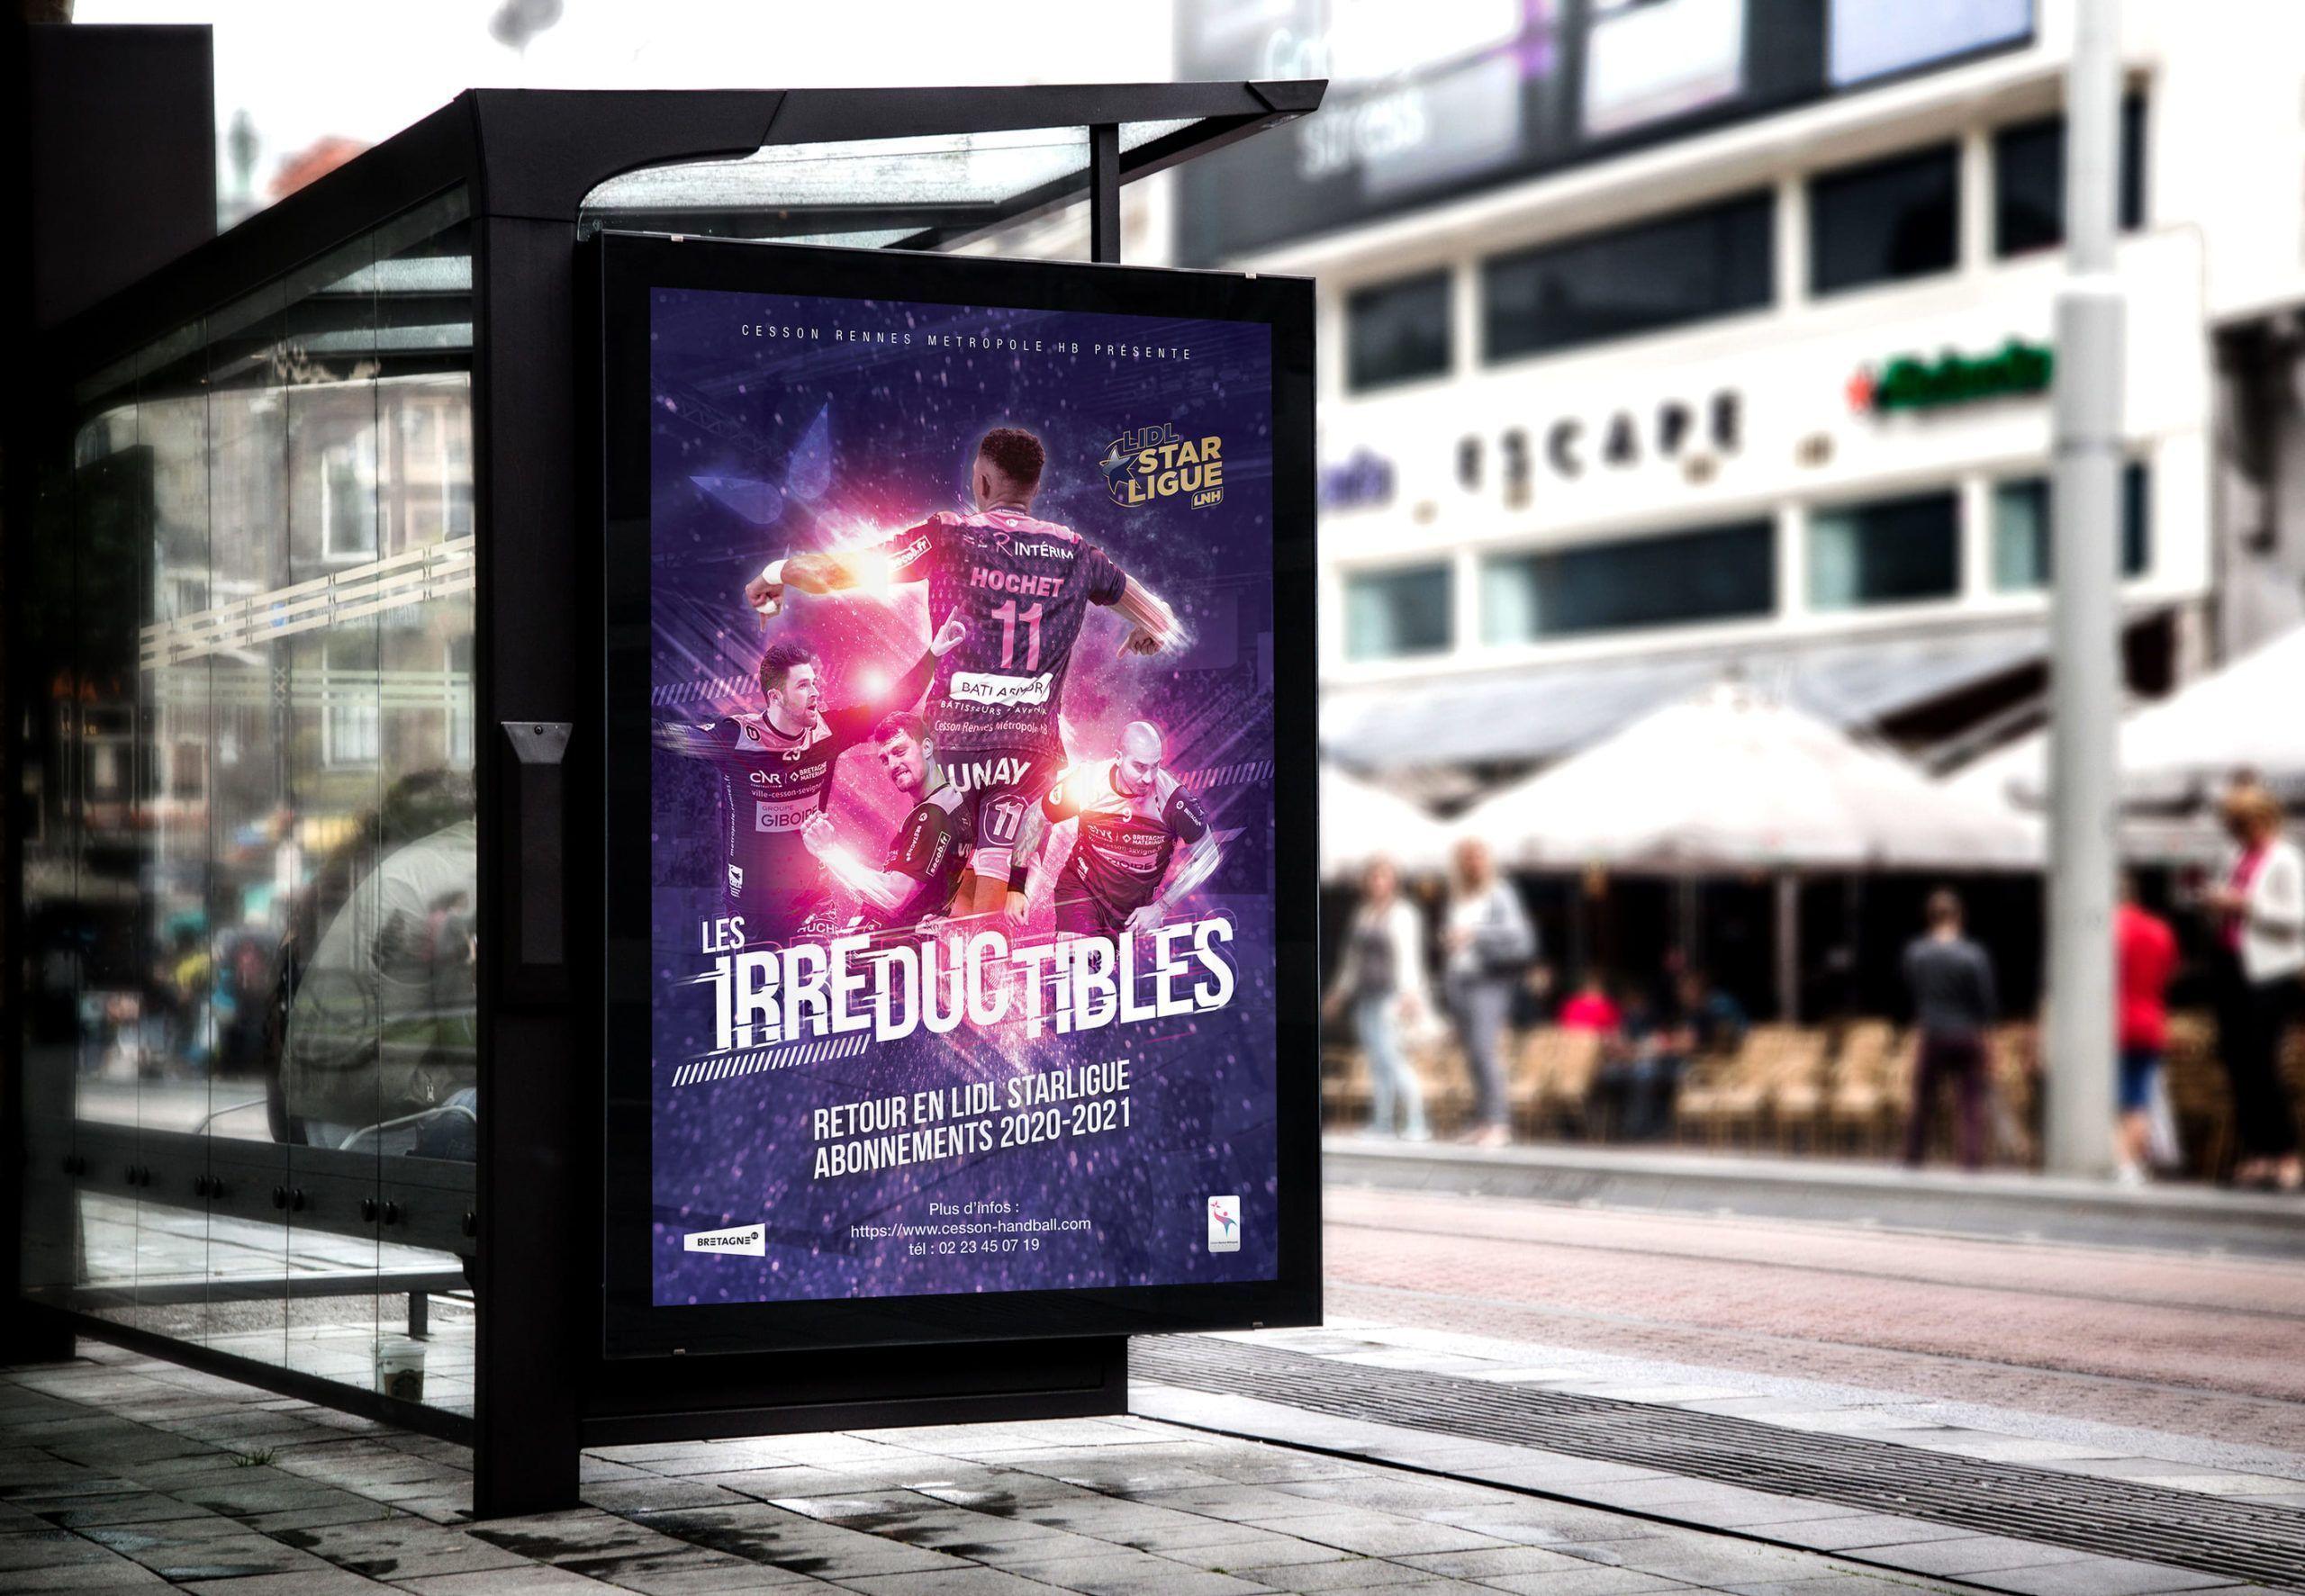 Affiche promotion campagne affichage 2021 cesson handball